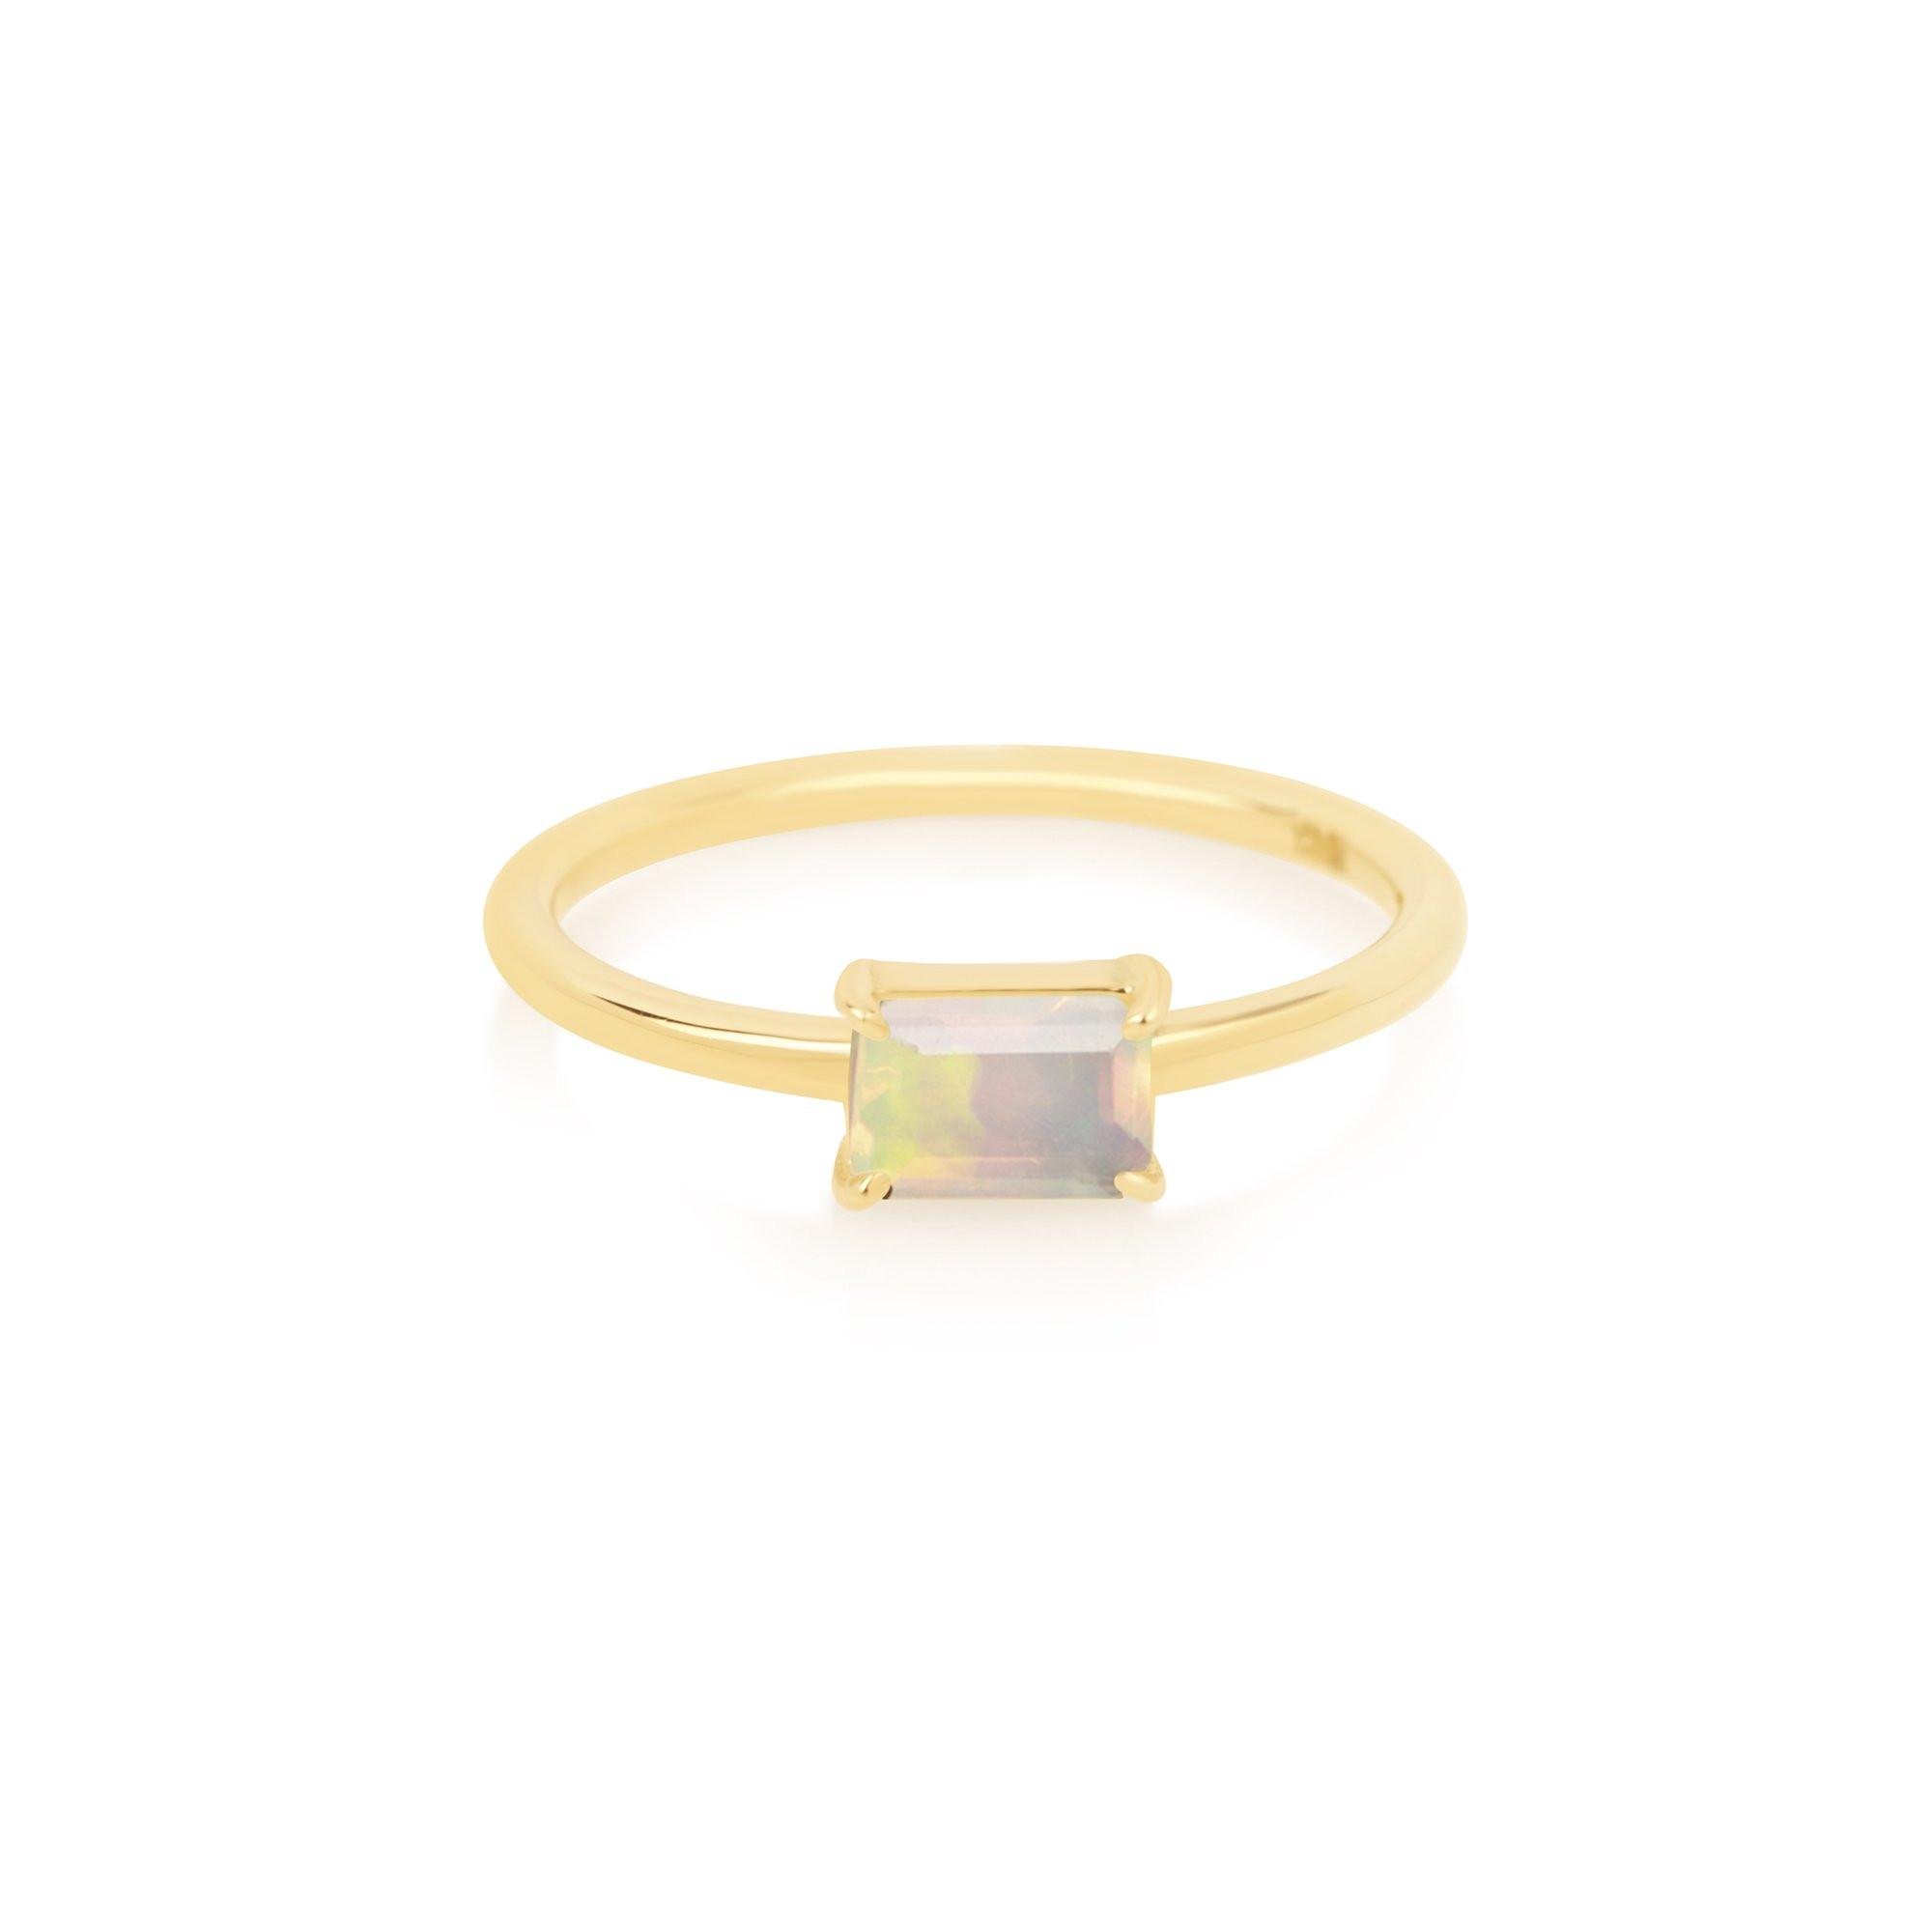 pointe-a-octagon-cutopal-ring.jpg